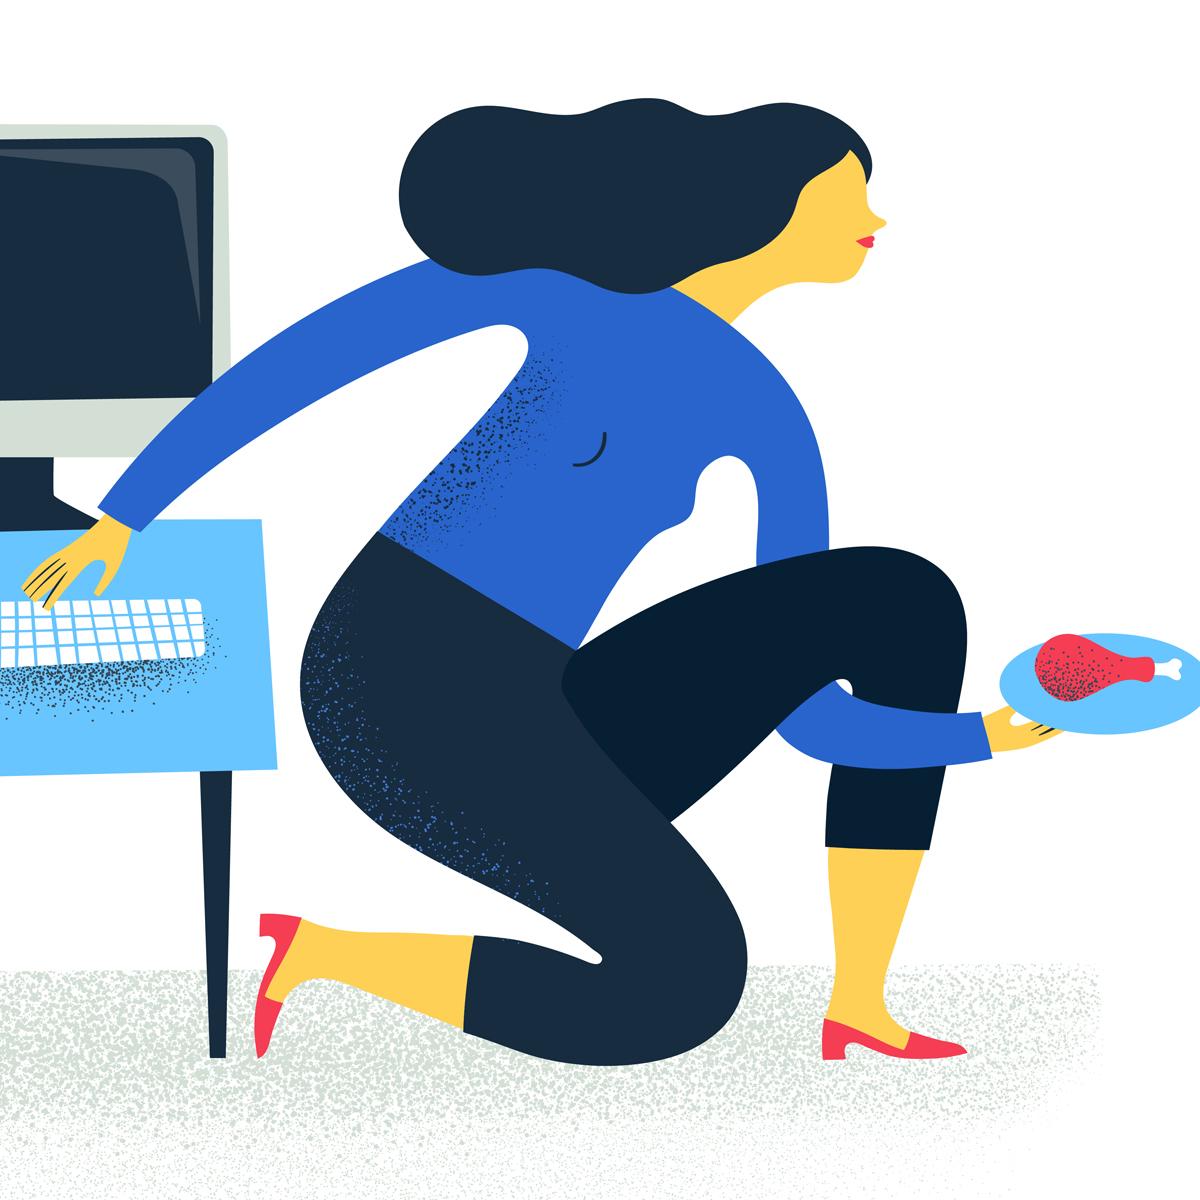 Illustrazione Multitasking © Silvia Bettini